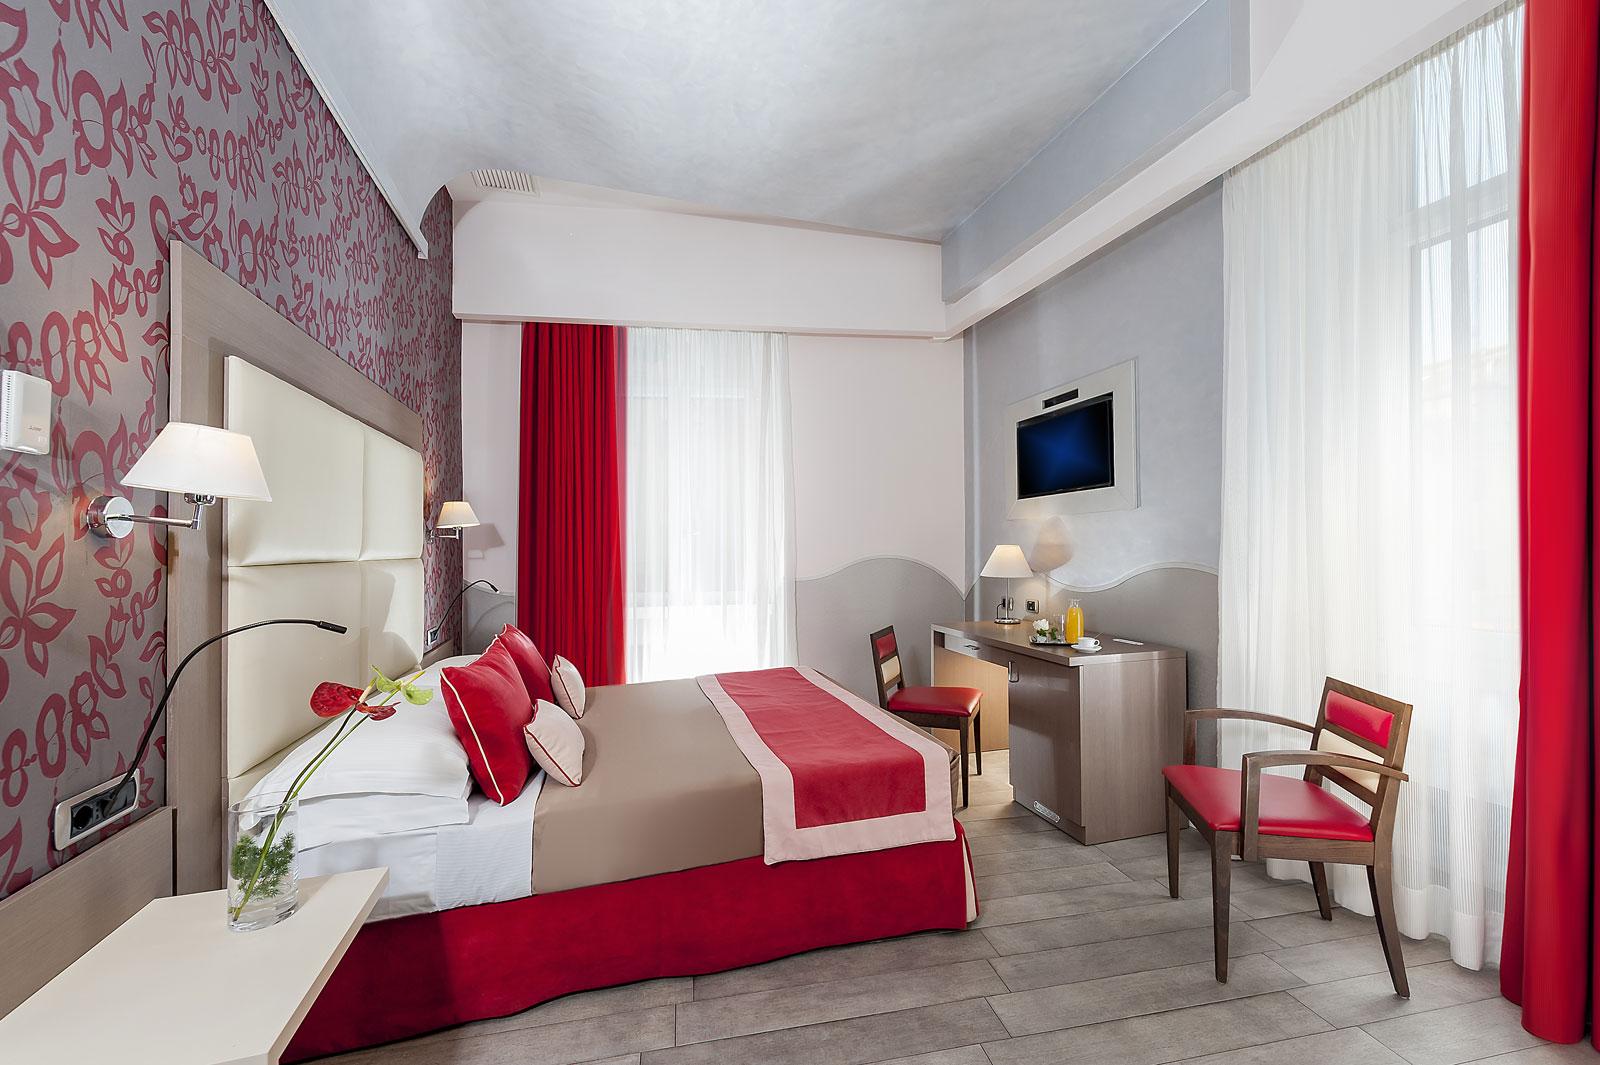 Demetra Hotel Rome New 4 Star Hotel In Rome City Center Near